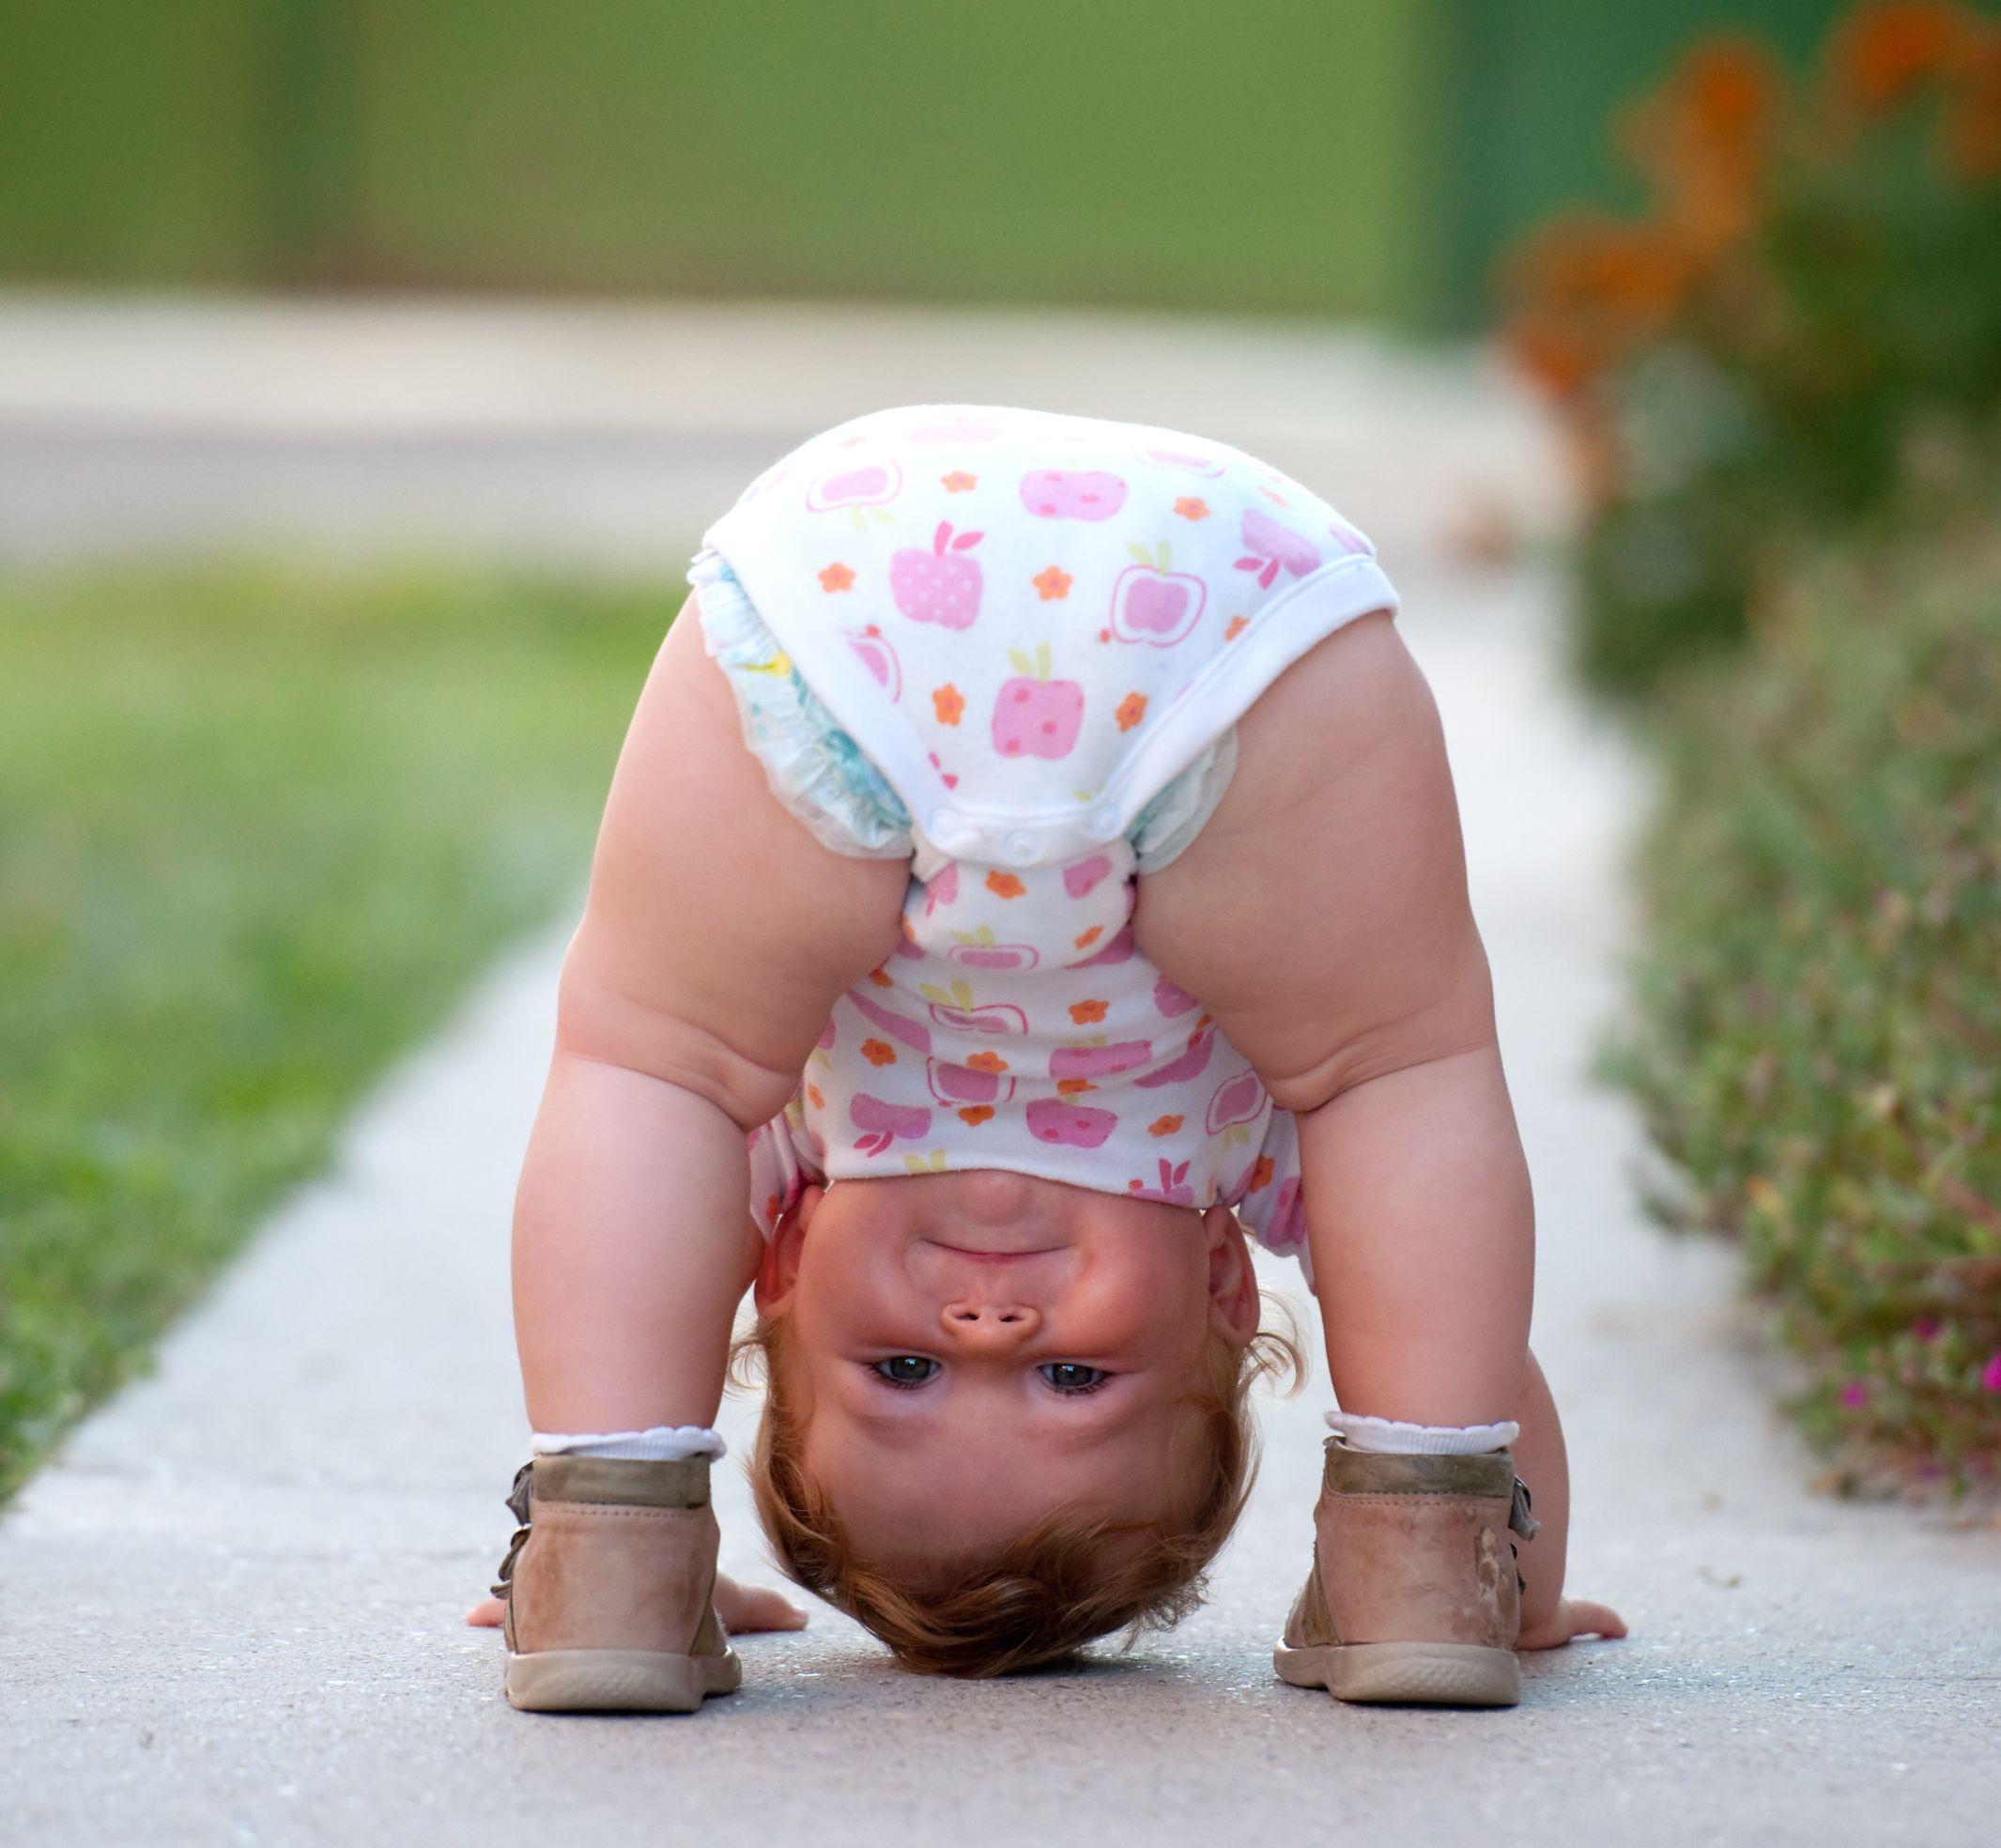 Baby Upside Down